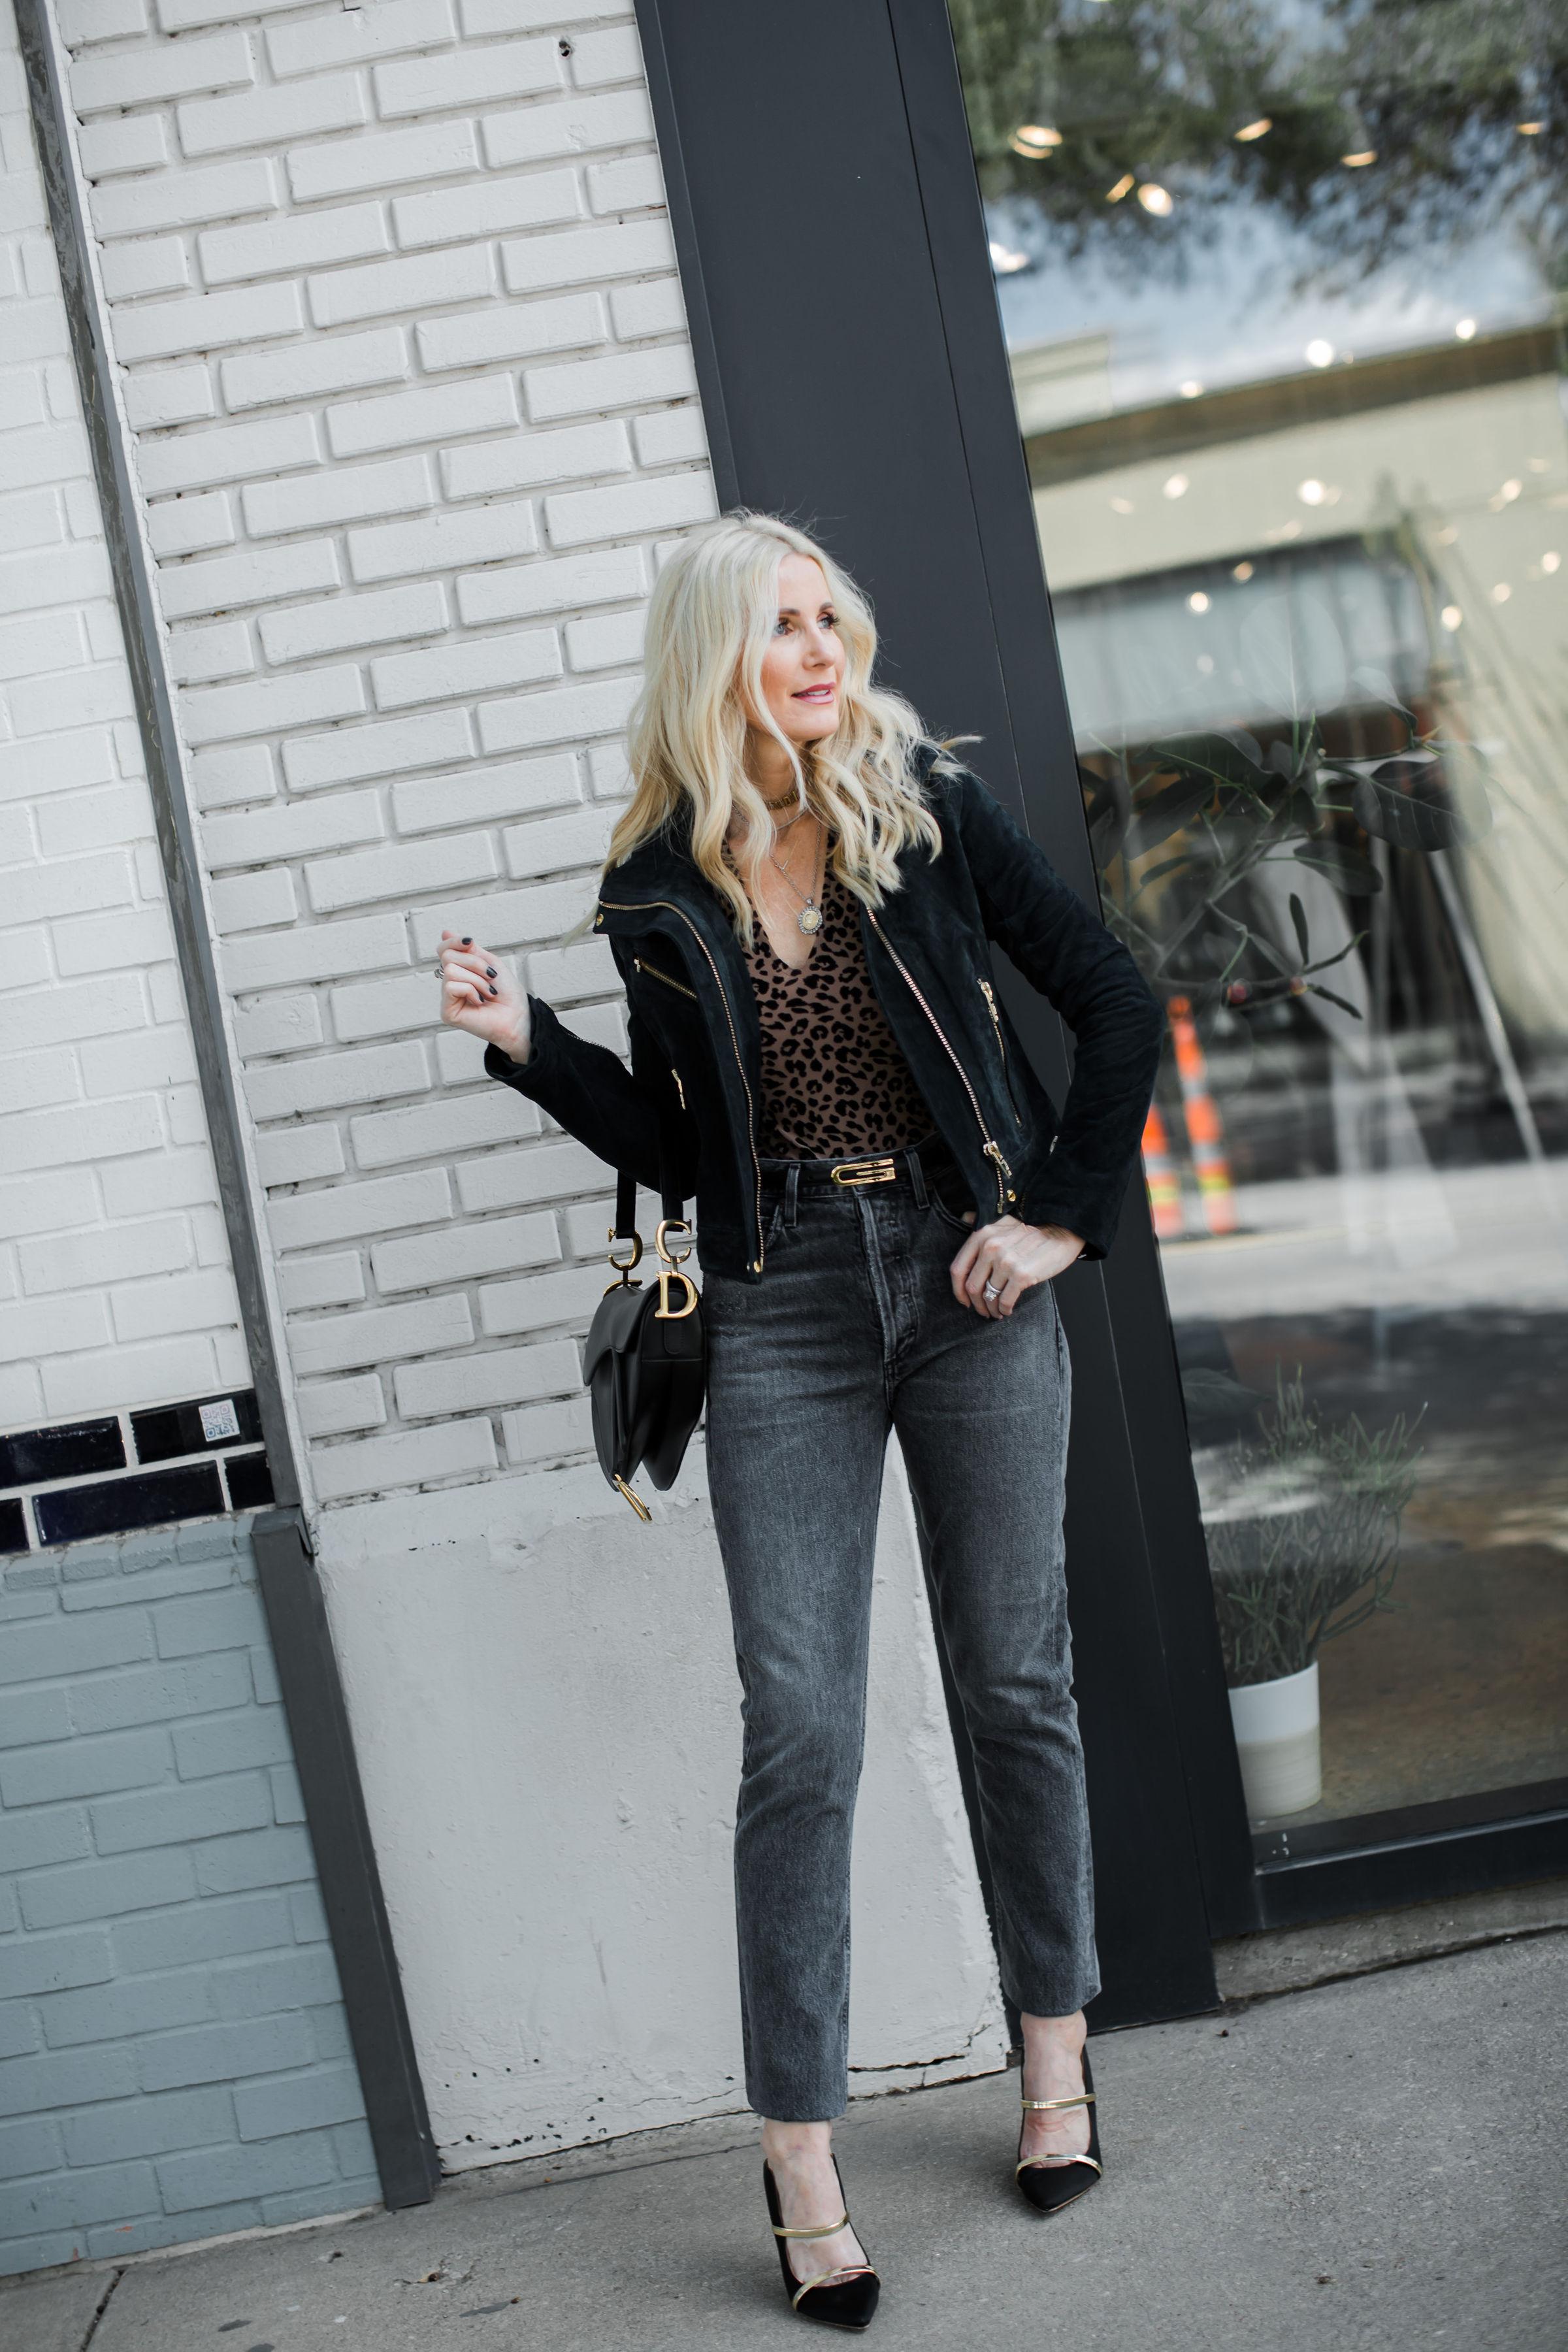 Dallas Fashion Blogger Wearing BlankNYC Jacket